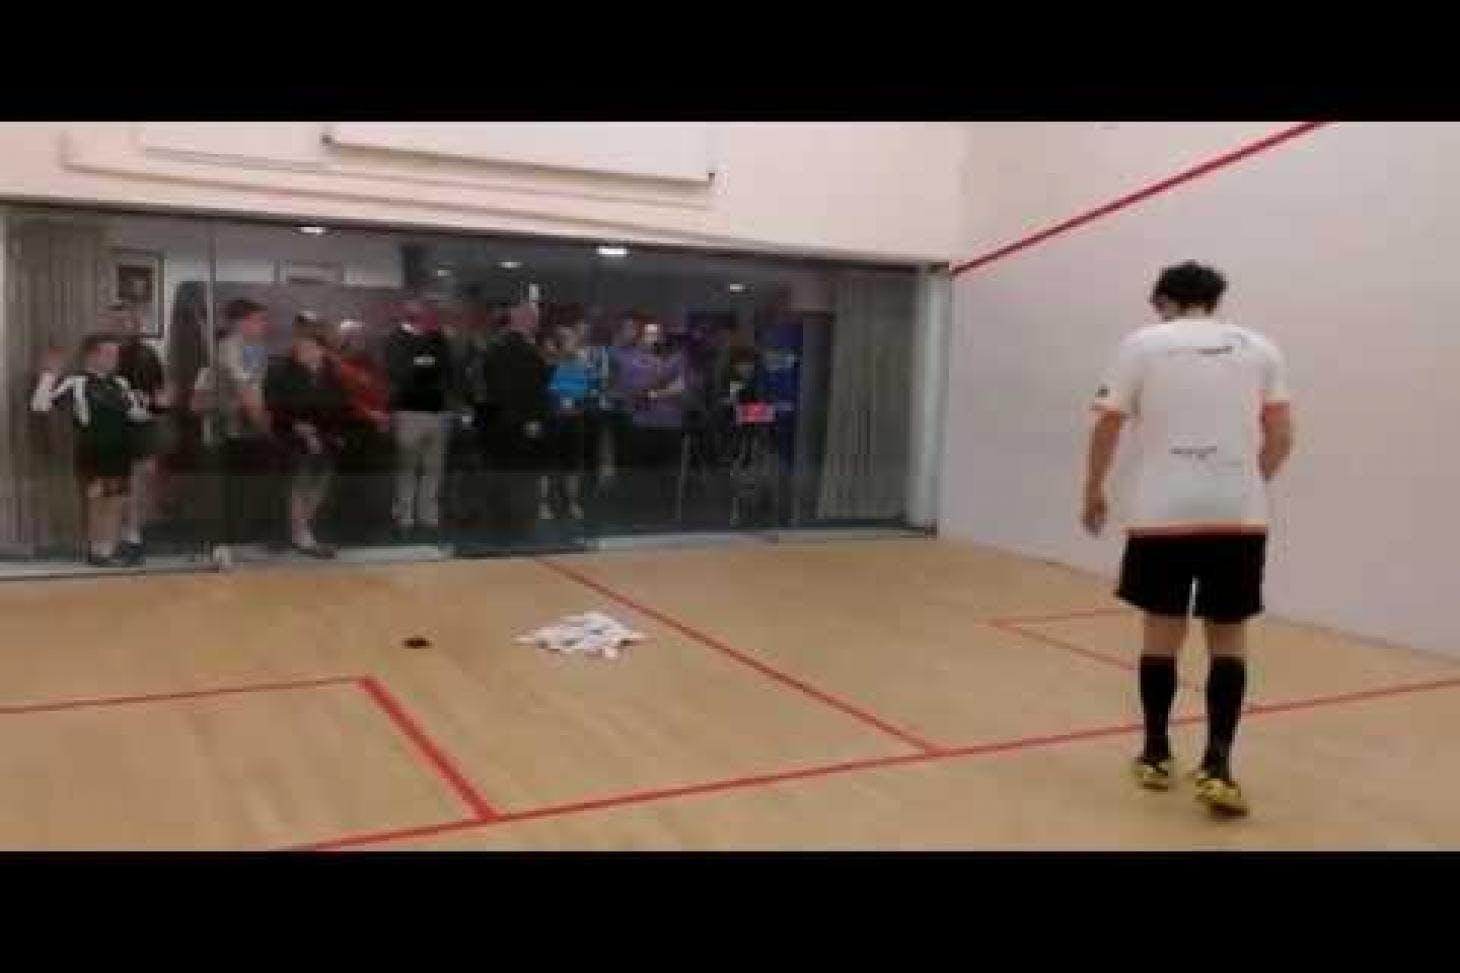 Southgate Squash & Racketball Club Indoor | Hard squash court